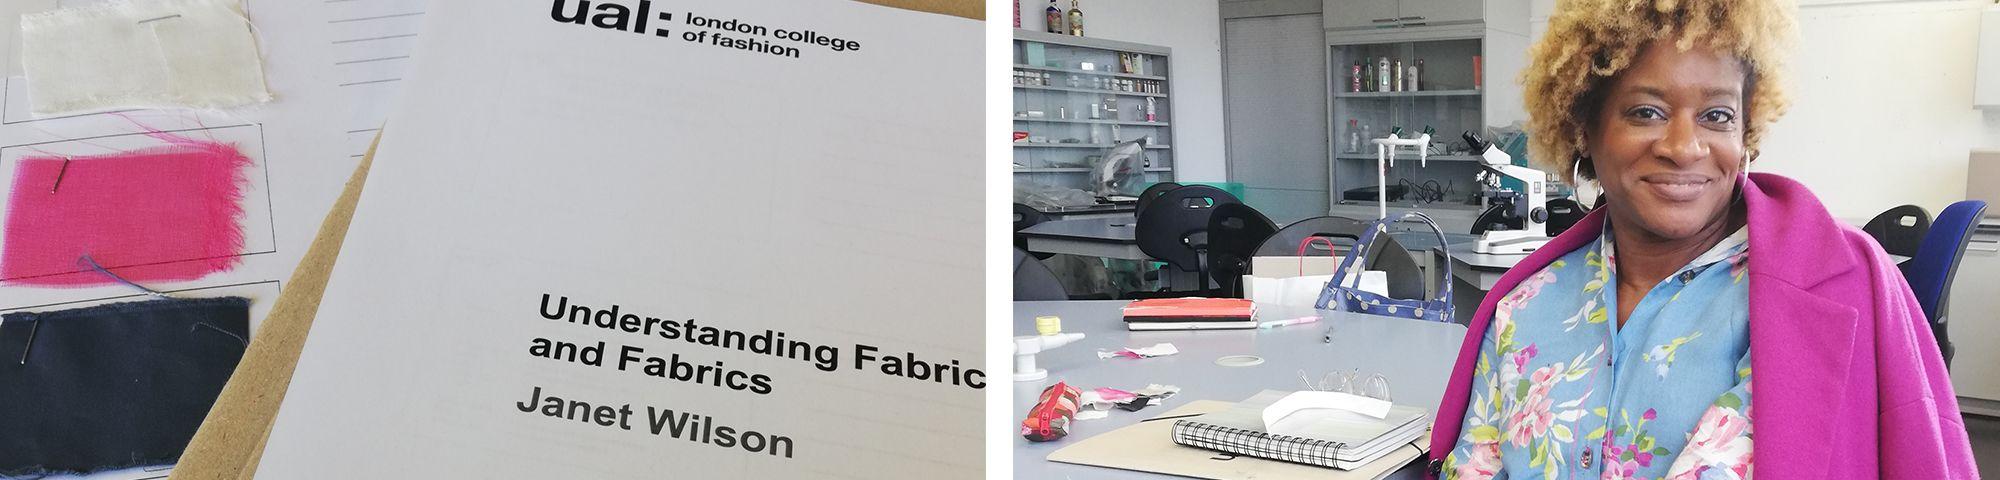 Geeghislaine Gazon Understanding Fabrics Banner LCF Short Course